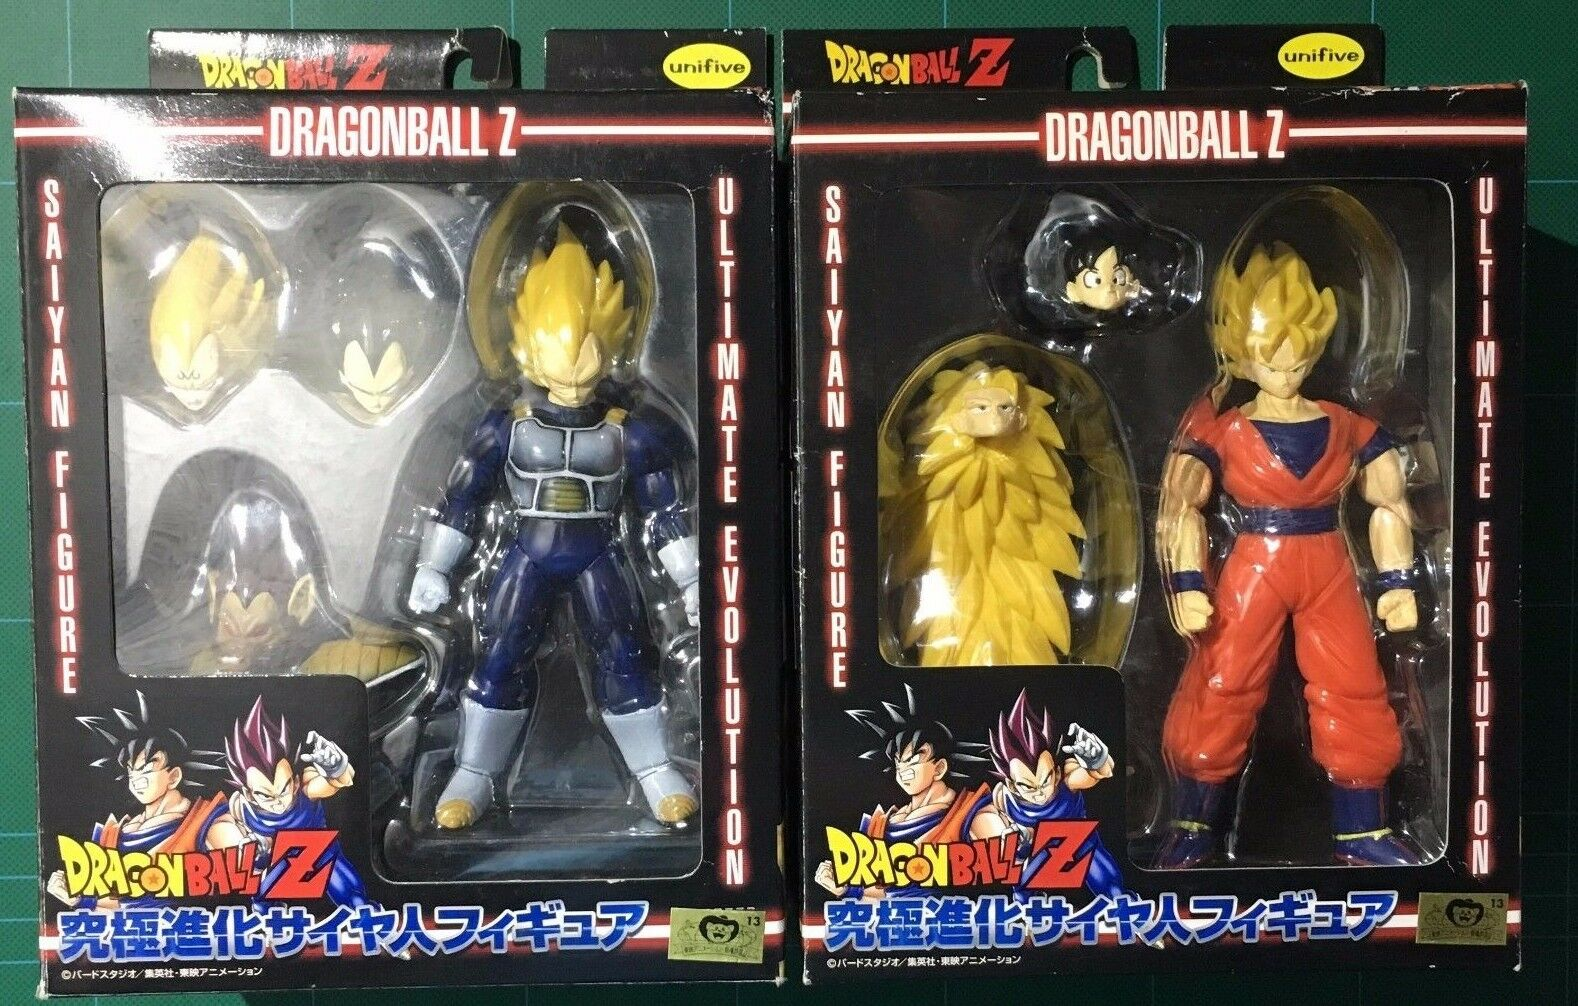 Dragon Btutti Z Vegeta  Goku Ultimate Evolution Saiyan cifra Unifive set 2 PZ